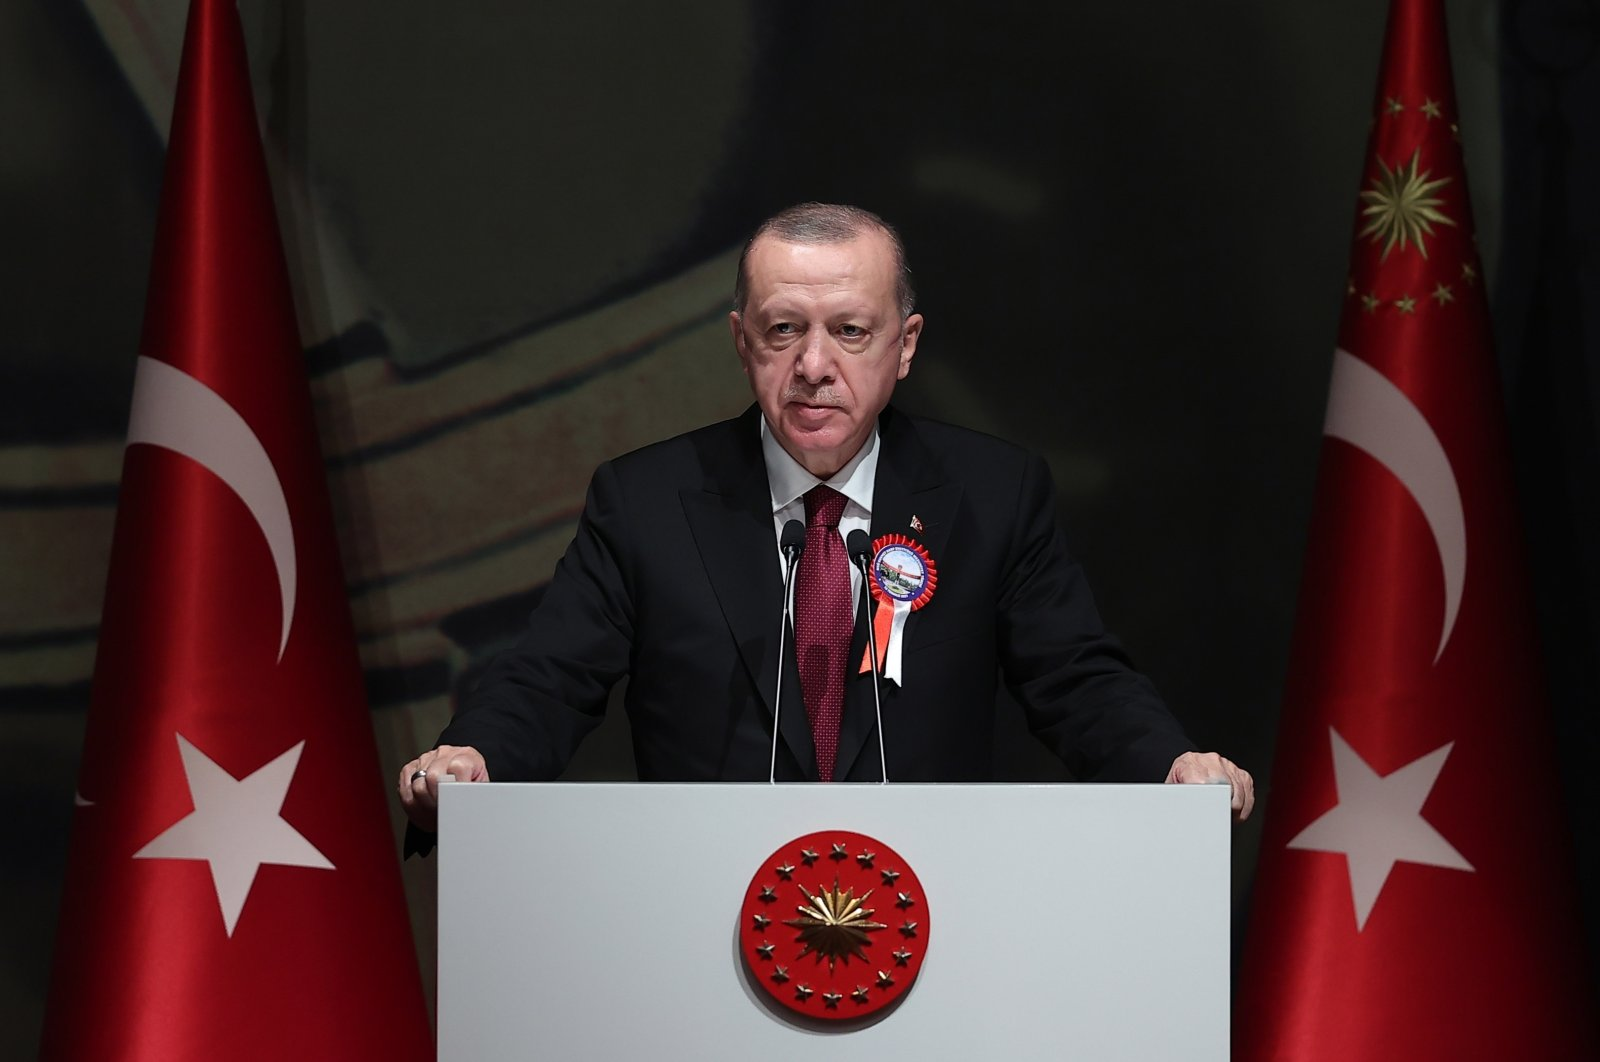 Turkish President Recep Tayyip Erdoğan speaks at the graduation ceremony of the National Defense University, Istanbul, Turkey, July 16, 2021. (AA Photo)